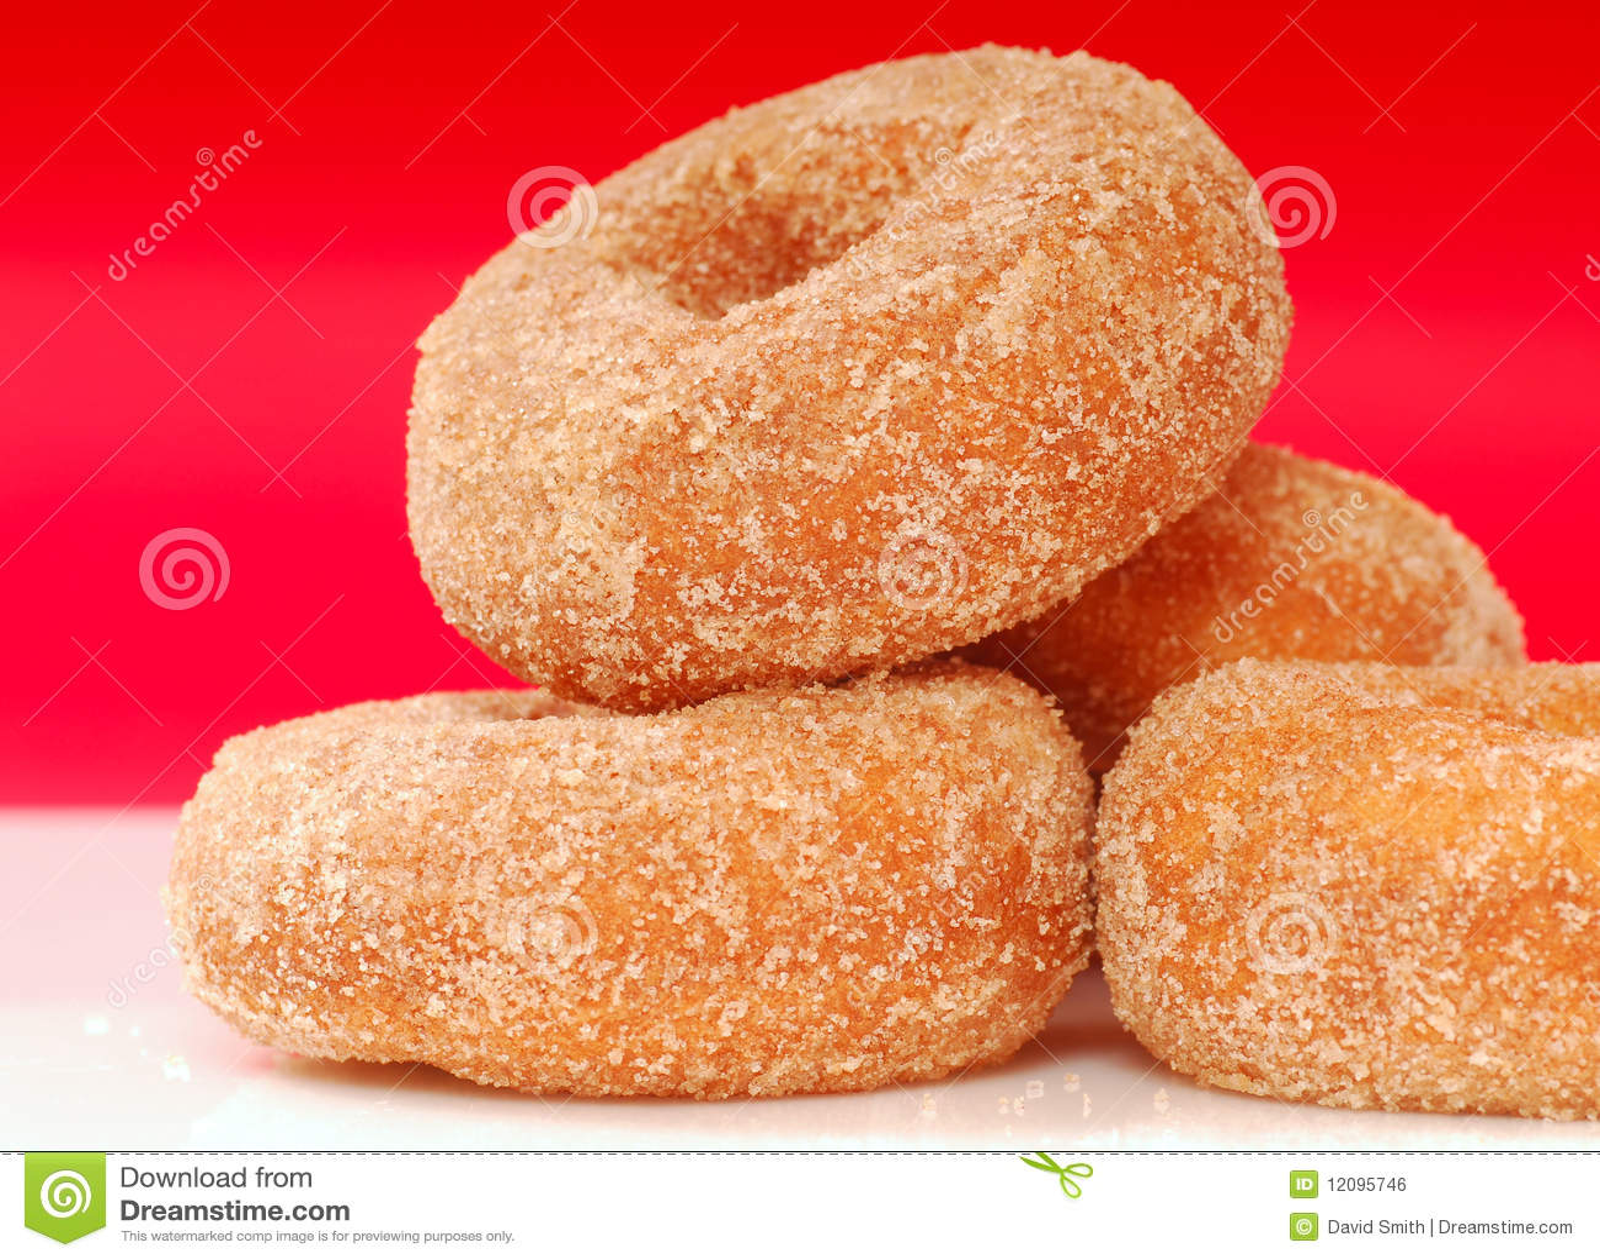 Freshly baked apple cinnamon donuts with cinnamon sugar.